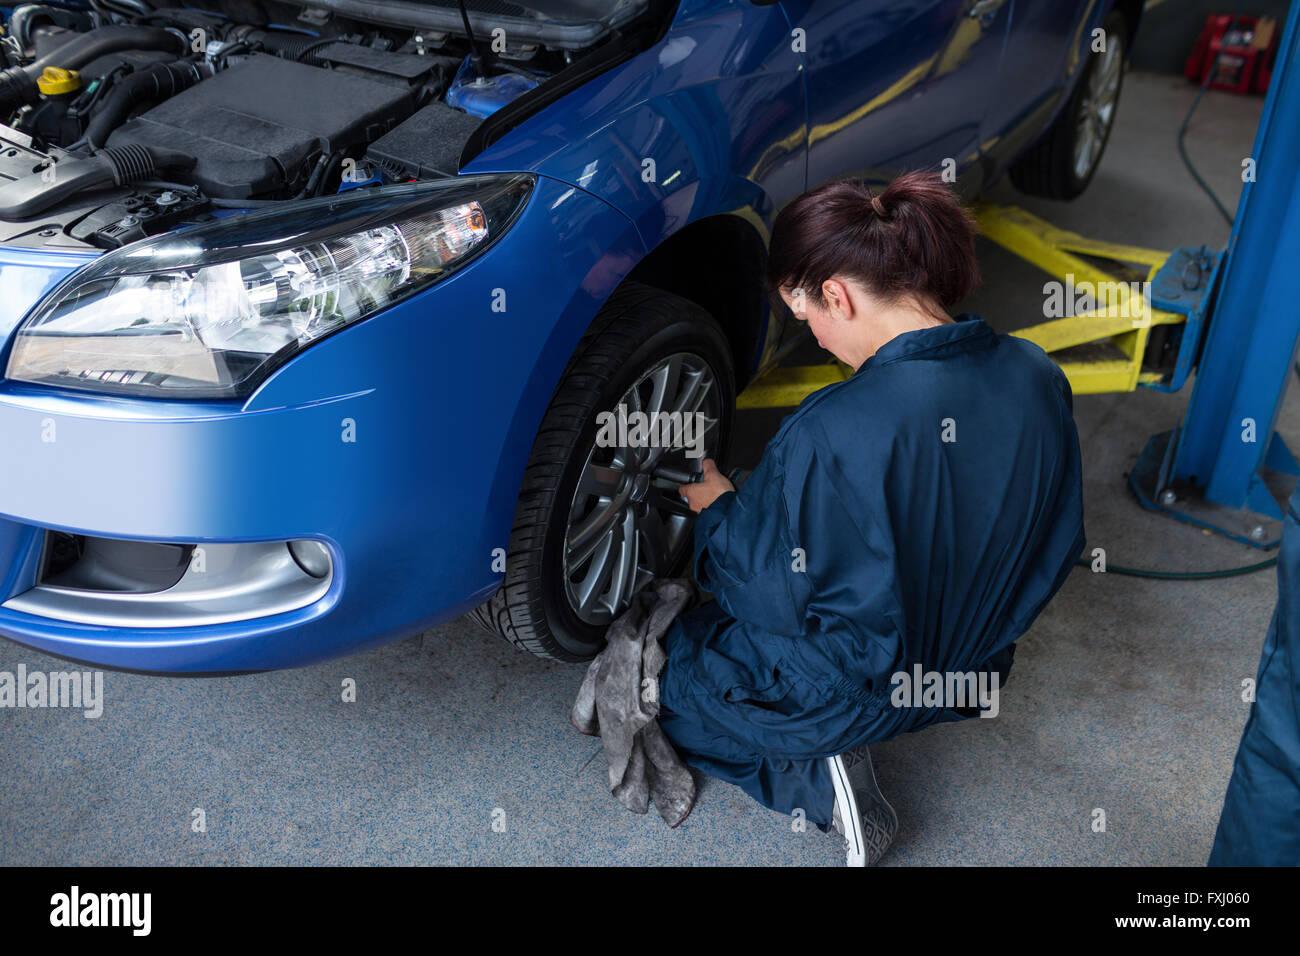 Female mechanic fixing a car wheel - Stock Image